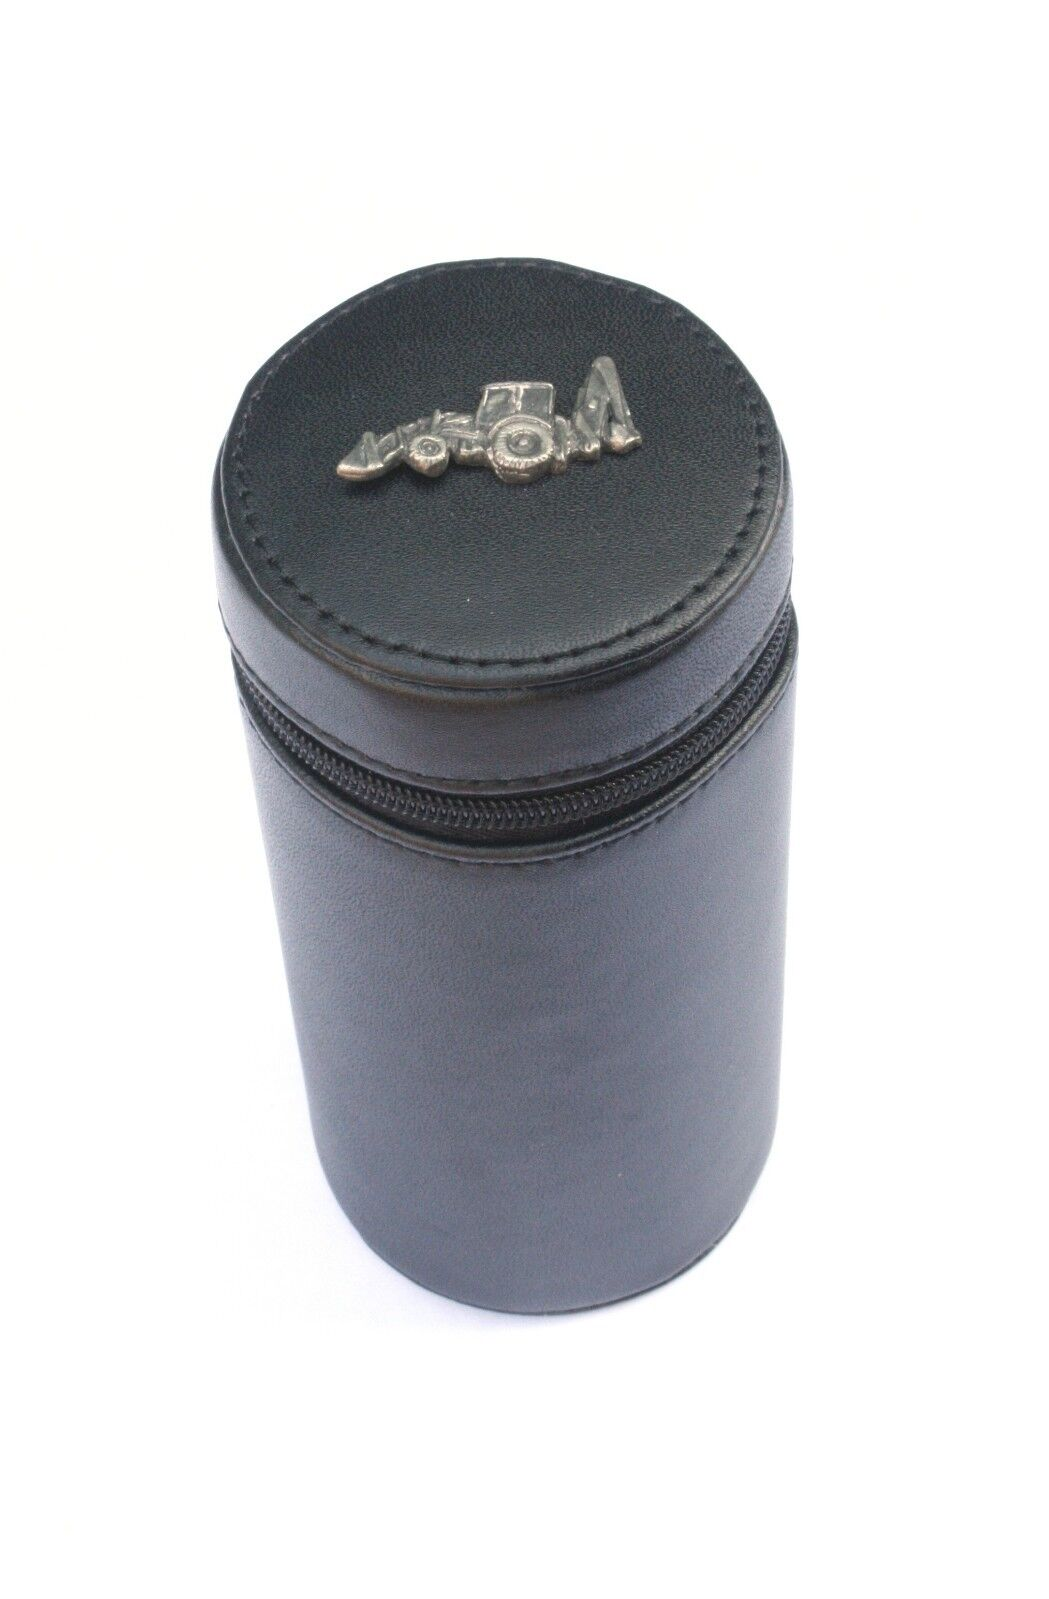 Digger JCB Shooting Peg Position Finder Numberojo Cups 1-10 negro Leather Case